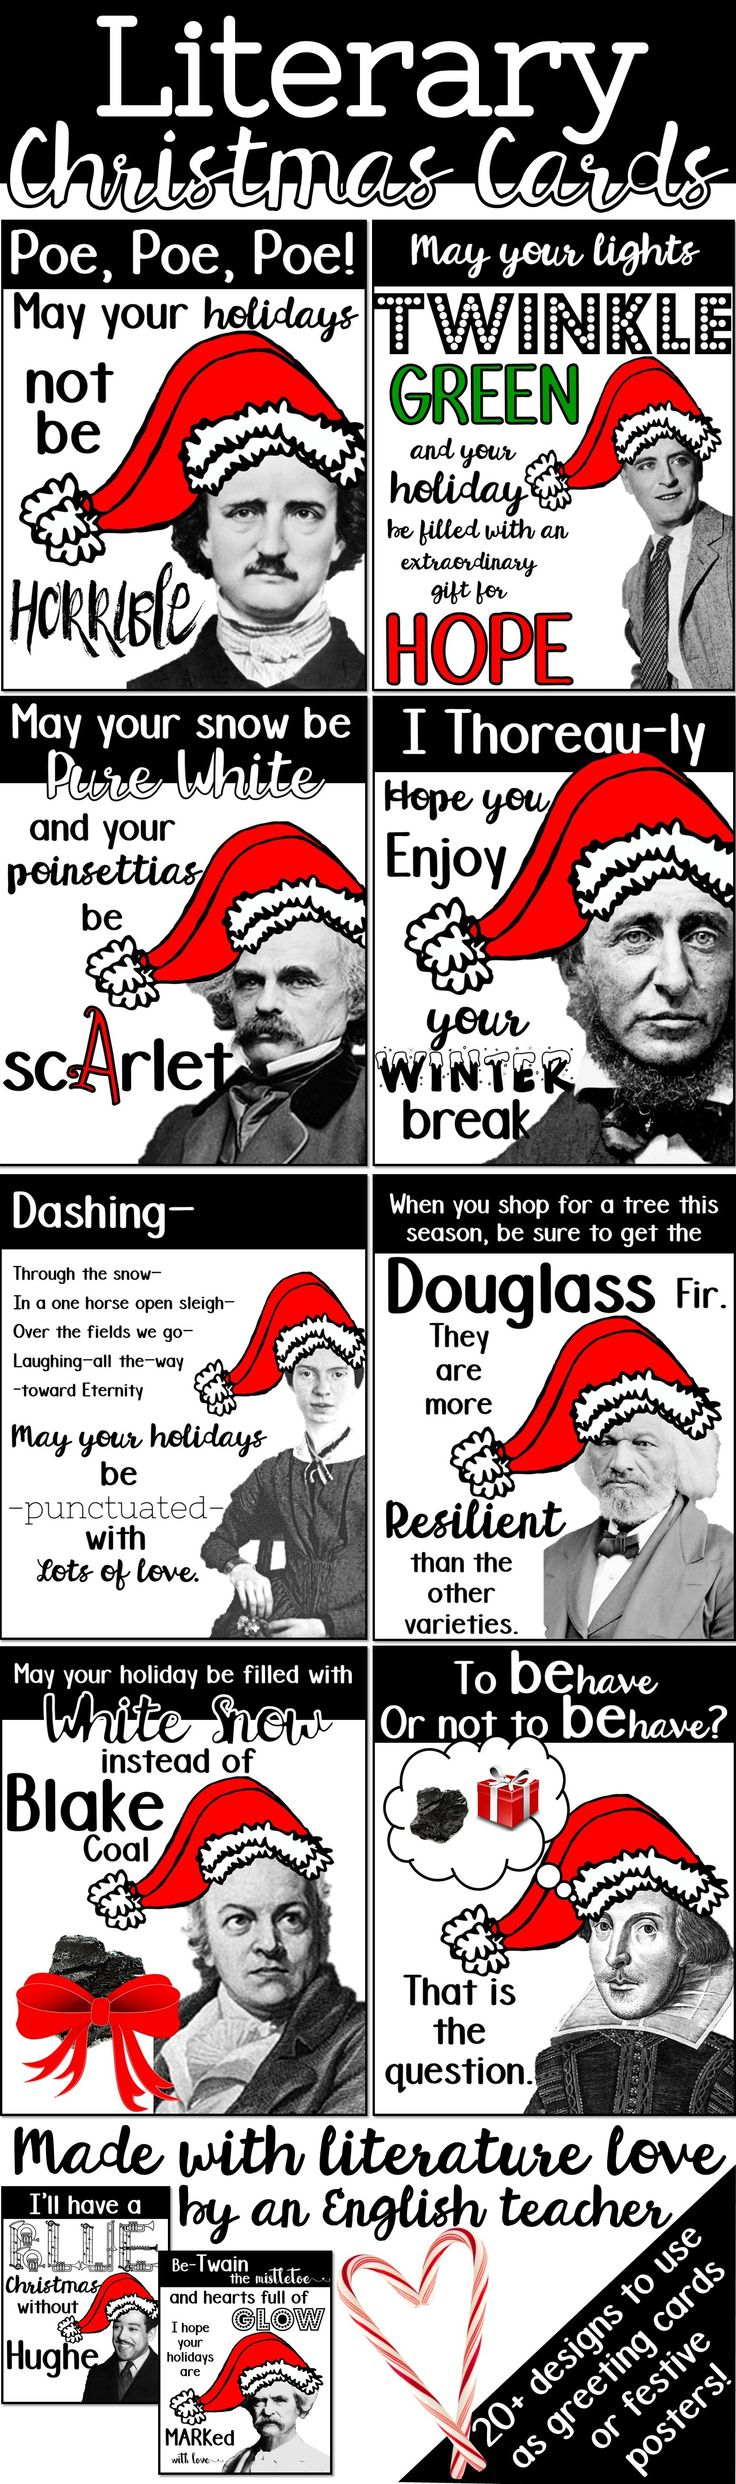 Literary Christmas cards, Bookish Christmas cards, English teacher Christmas cards, Author Christmas cards, Bookish Holiday cards, Bookish greeting cards